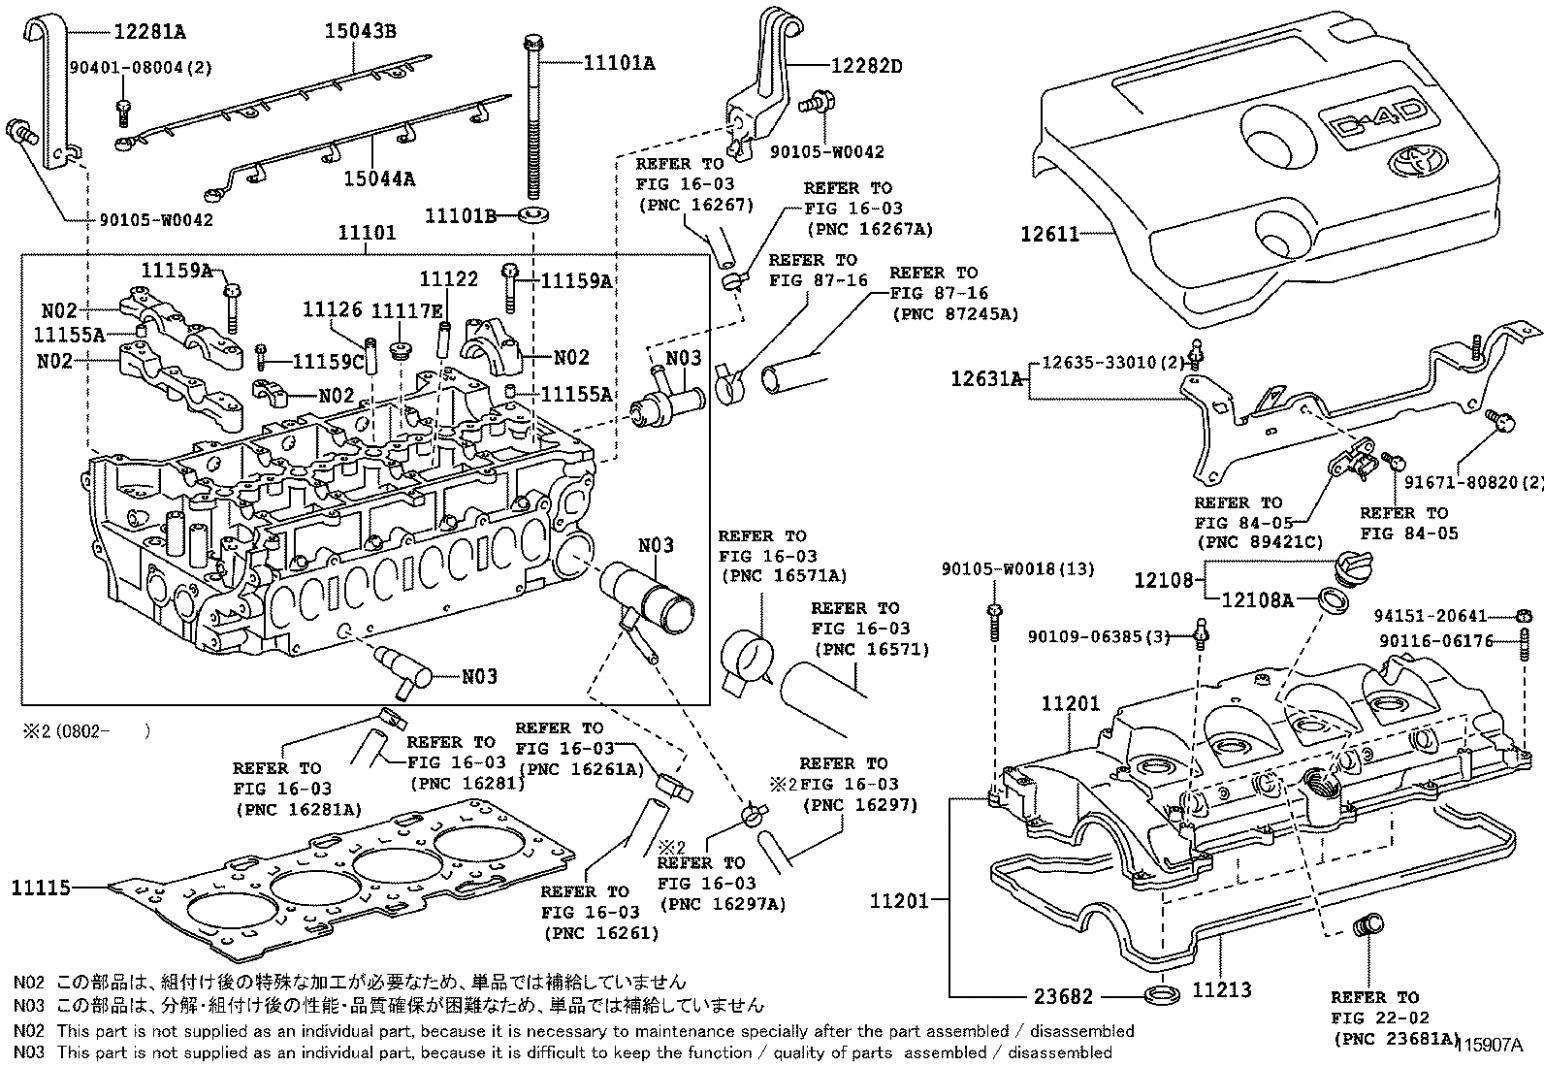 Toyota Corolla Verso Engine Diagram Toyota Corolla Verso Engine Diagram